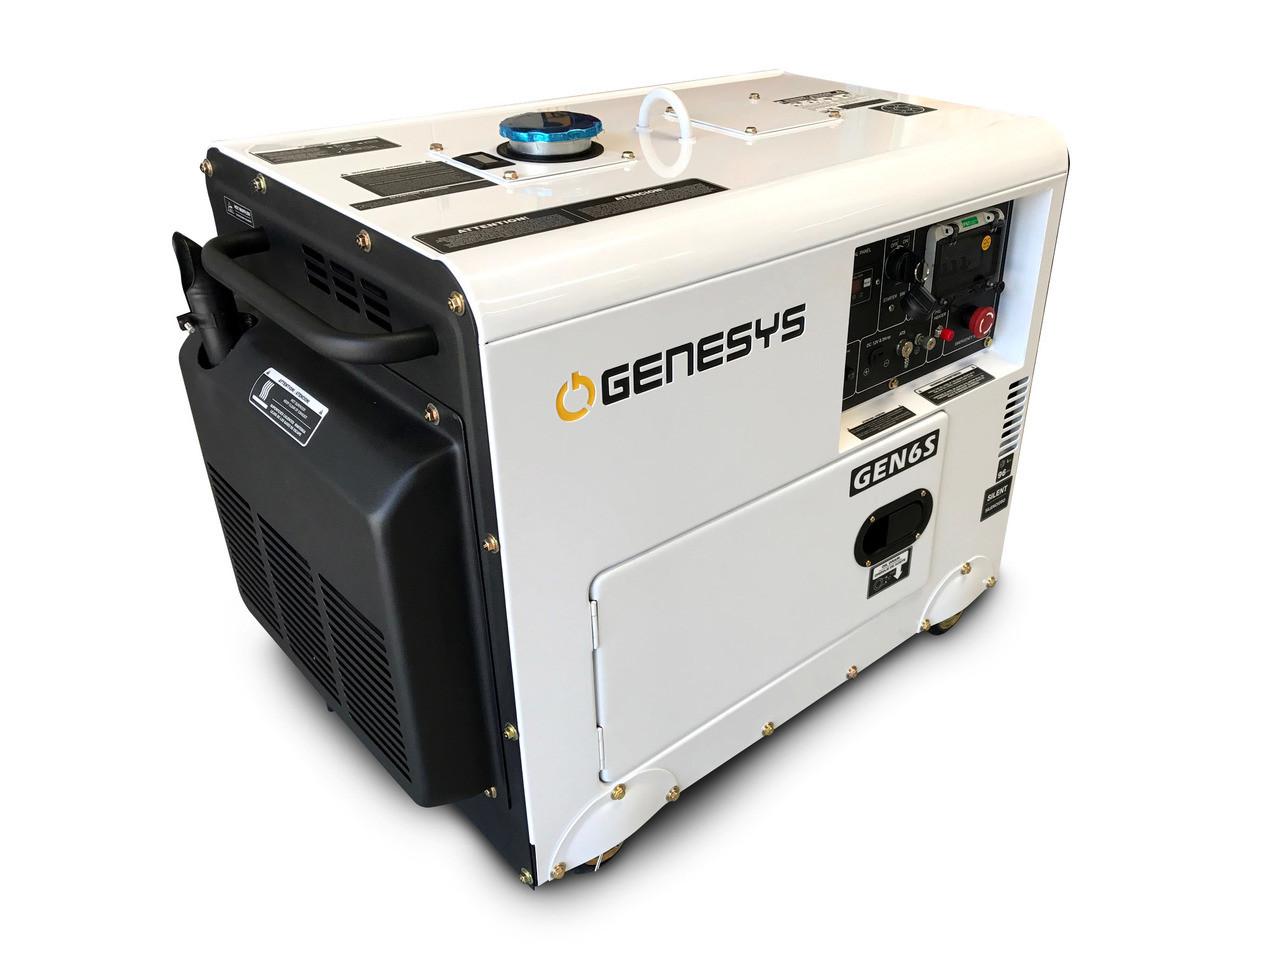 6kva Diesel Generator Portable Silenced Canopy Blue Diamond Bestdieselgeneratorcom